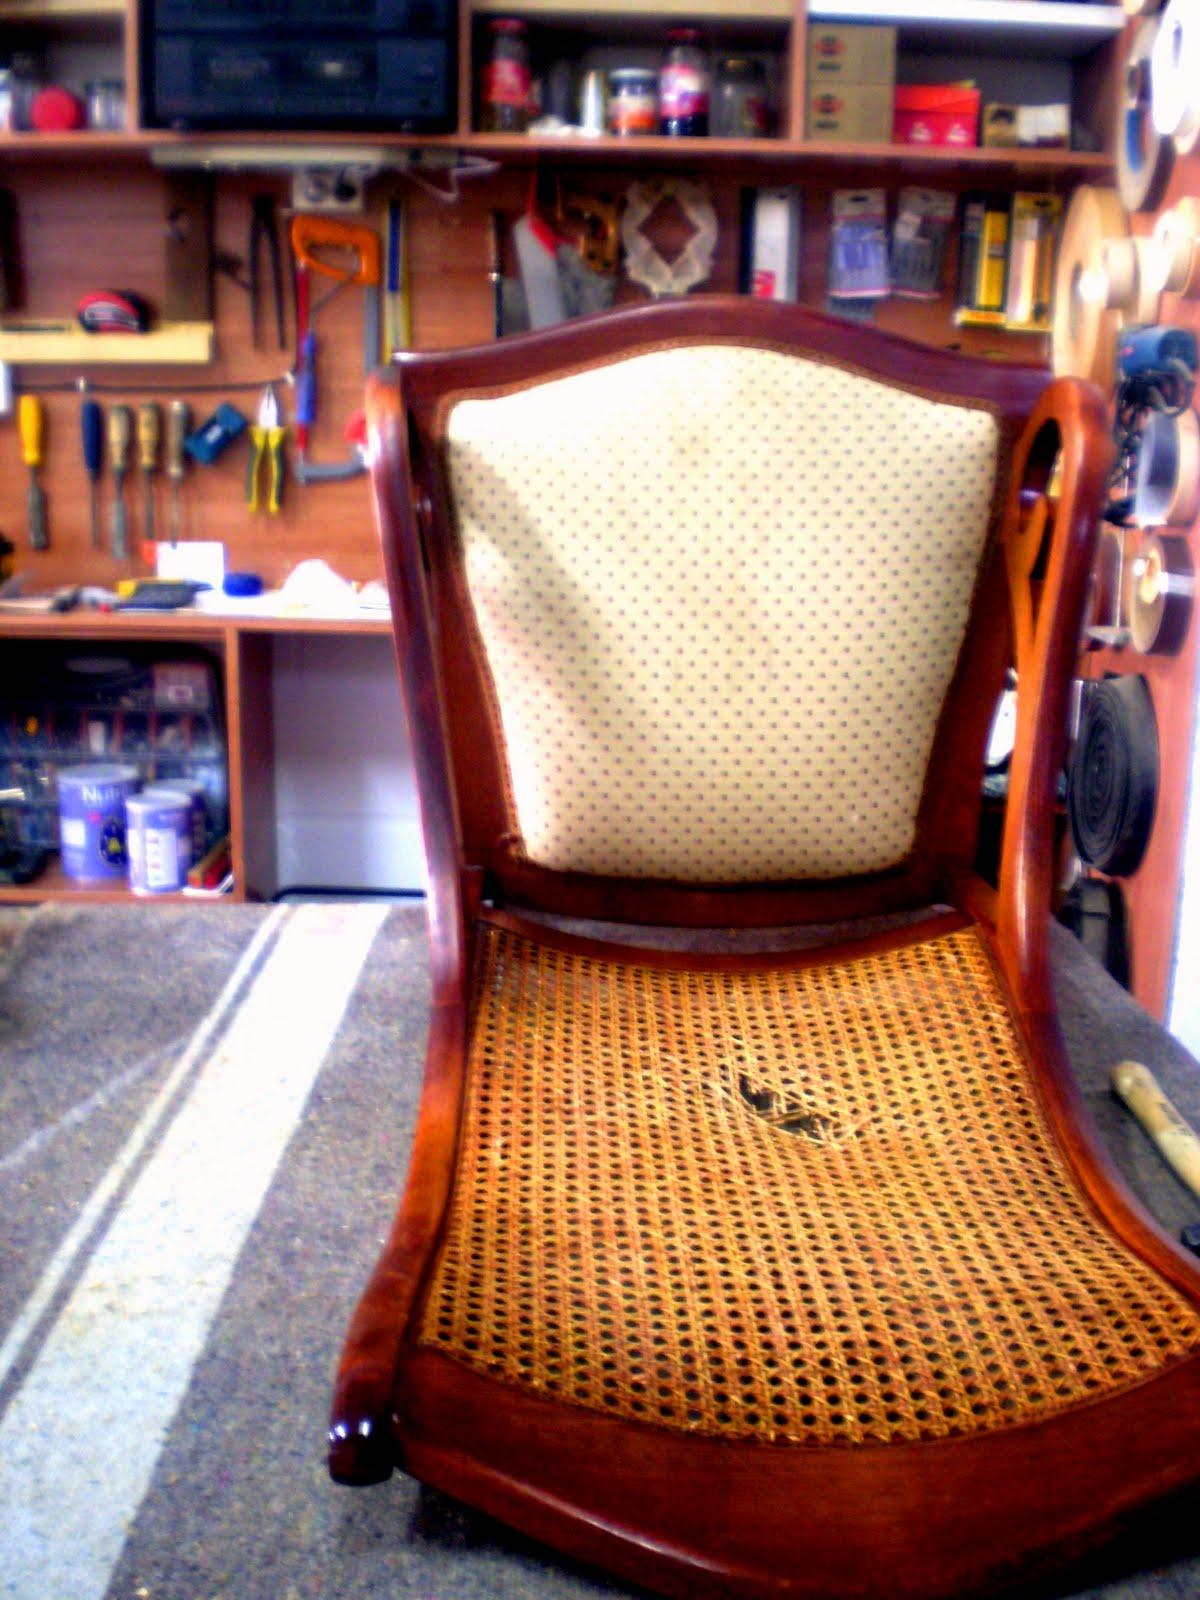 Restauracion muebles curso de restauracion de muebles - Restauracion de muebles viejos ...